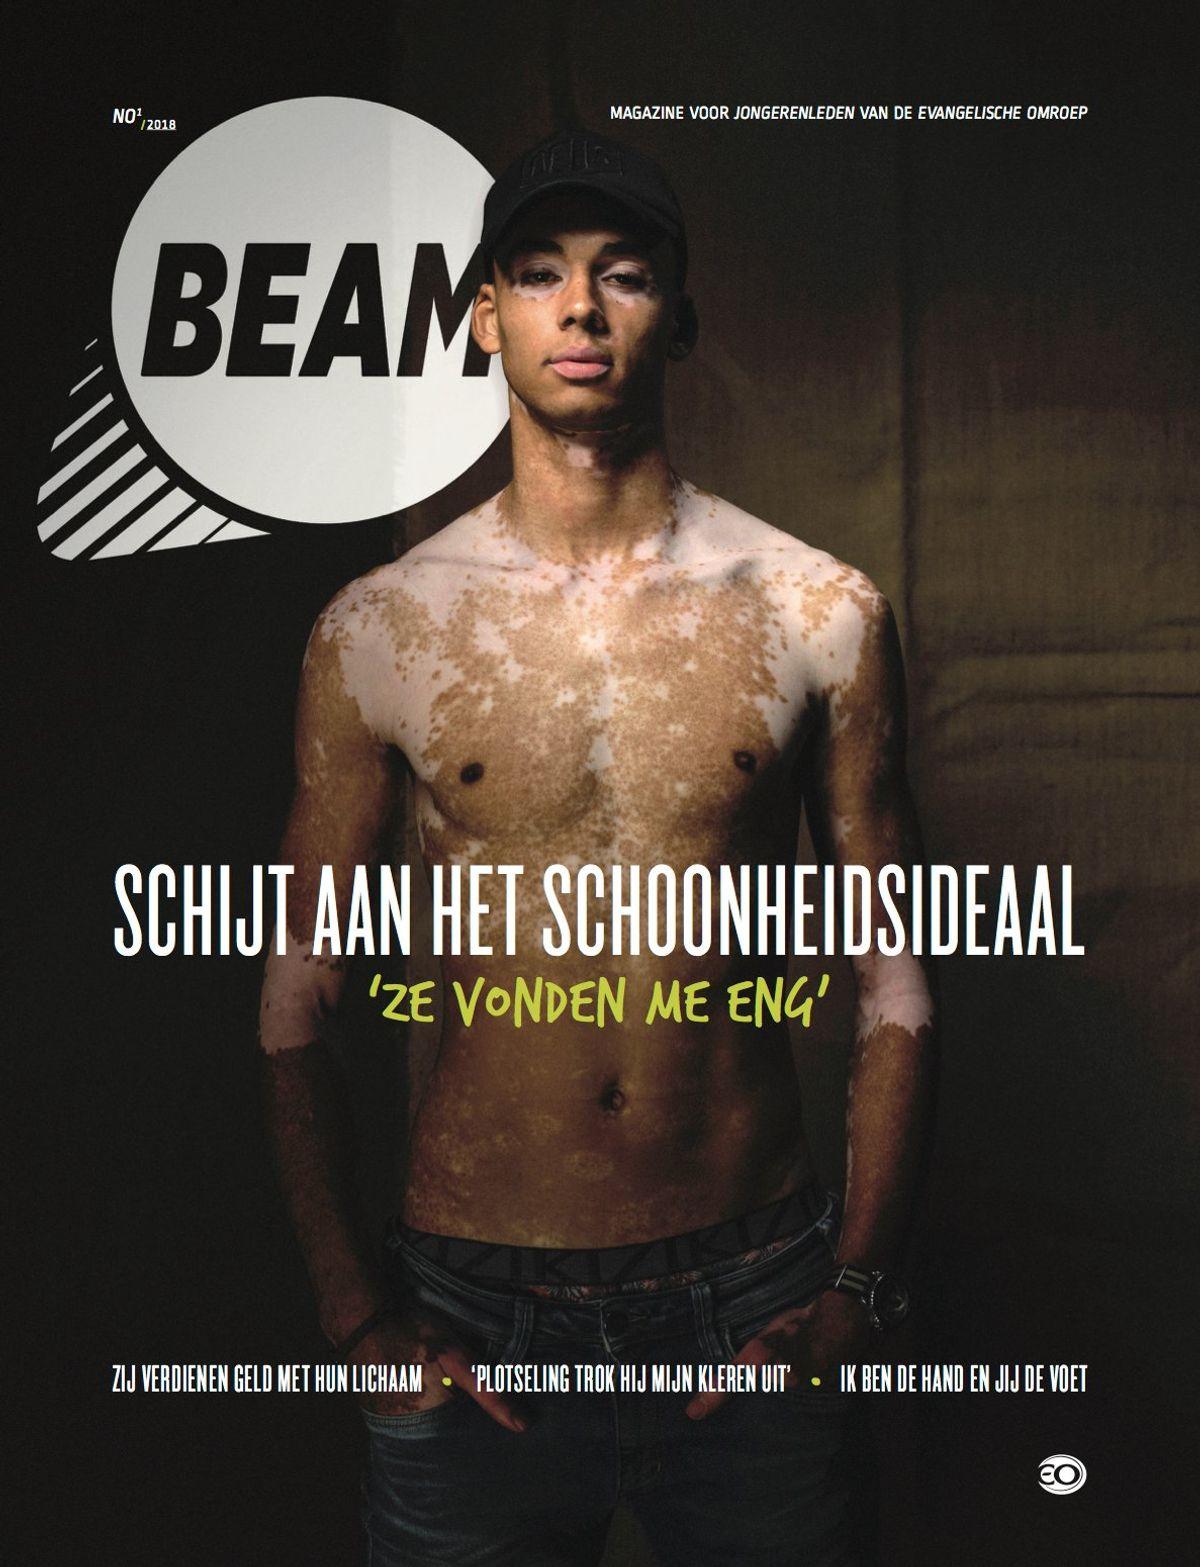 BEAM_2018_1_COVER